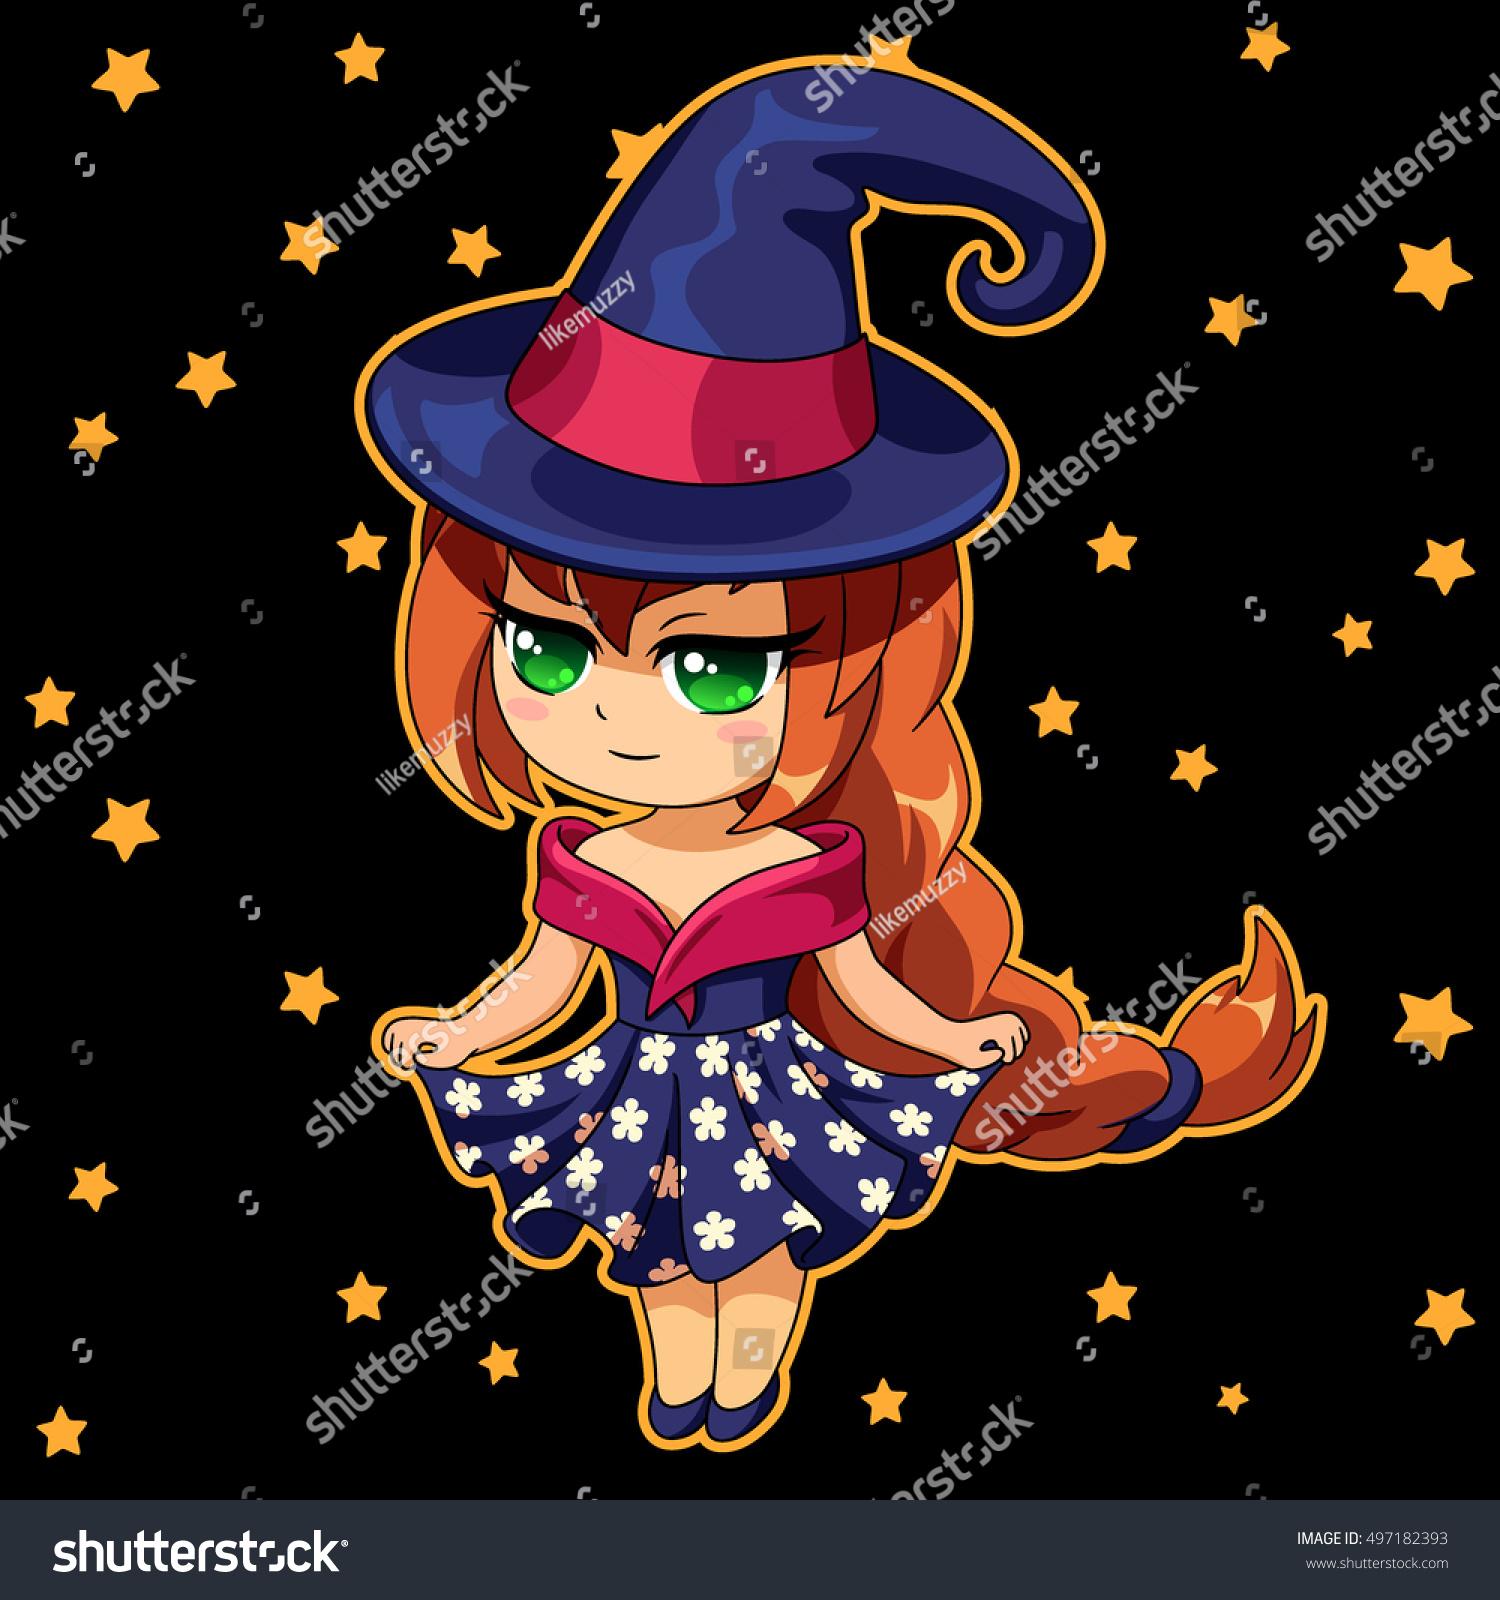 cute cartoon witch anime manga style stock vector